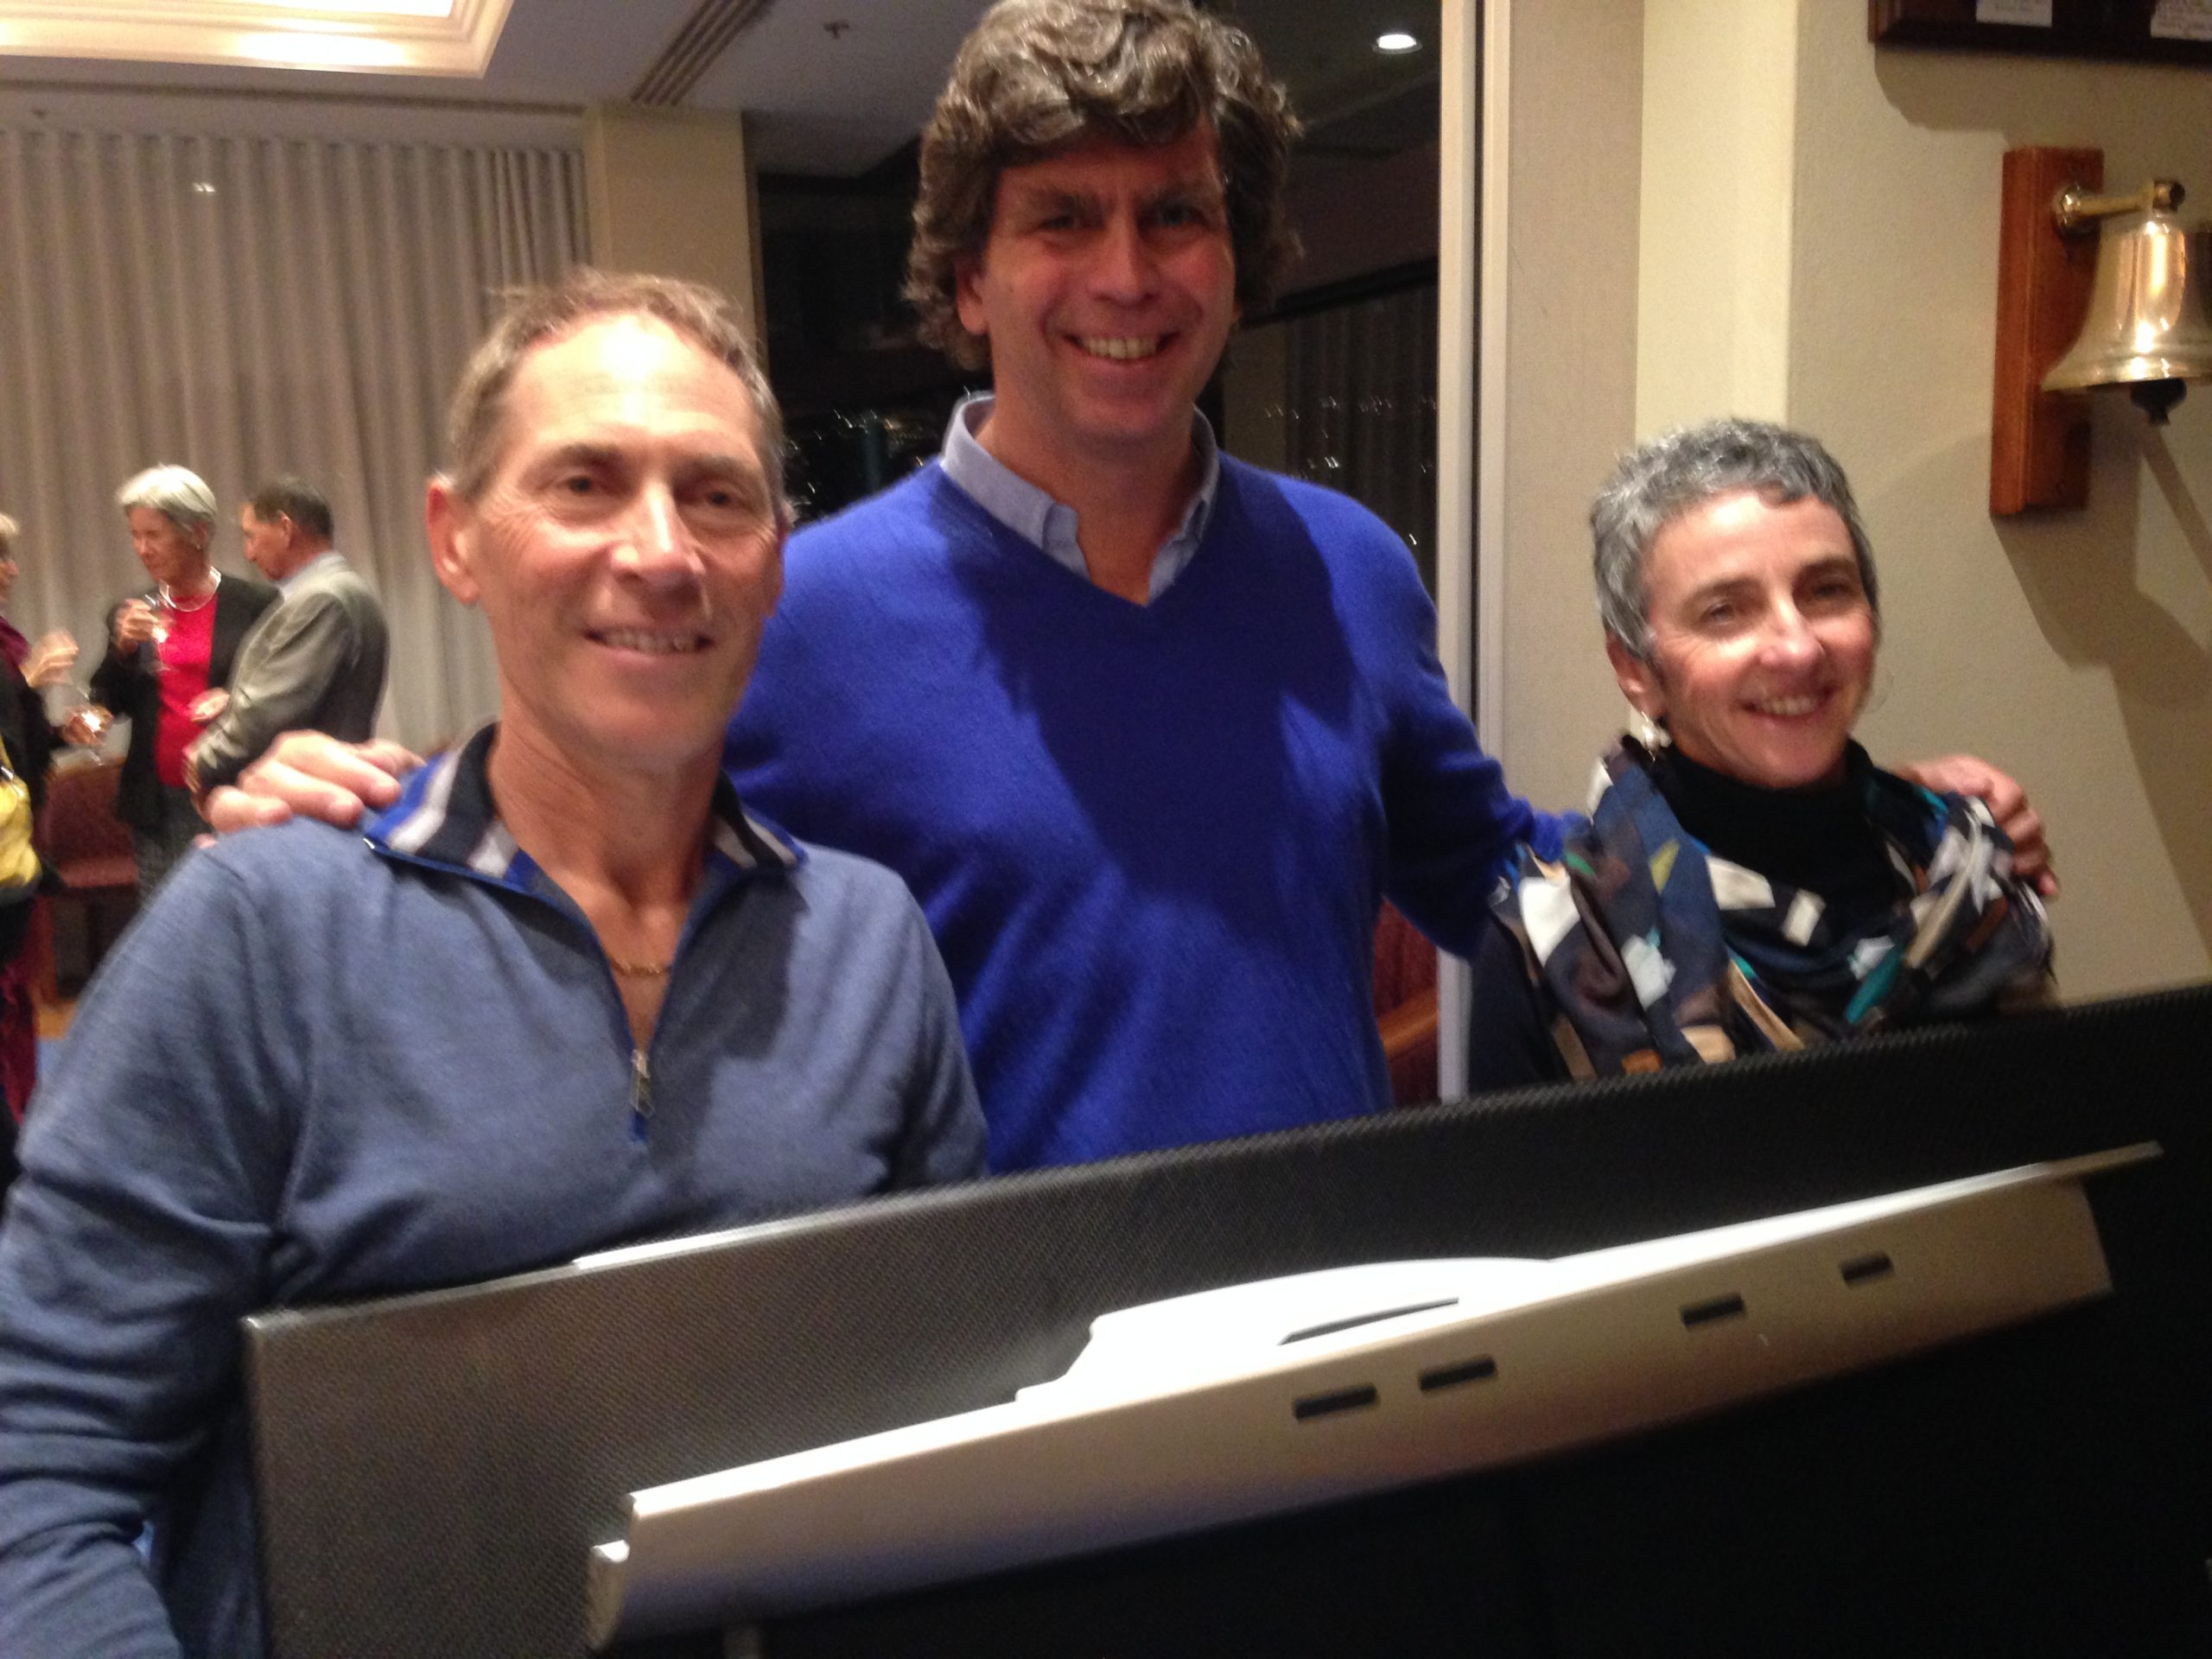 Guido-and-Michele-Belgiorno-Nettis-with-Manny-Frers---Di-Pearson-pic